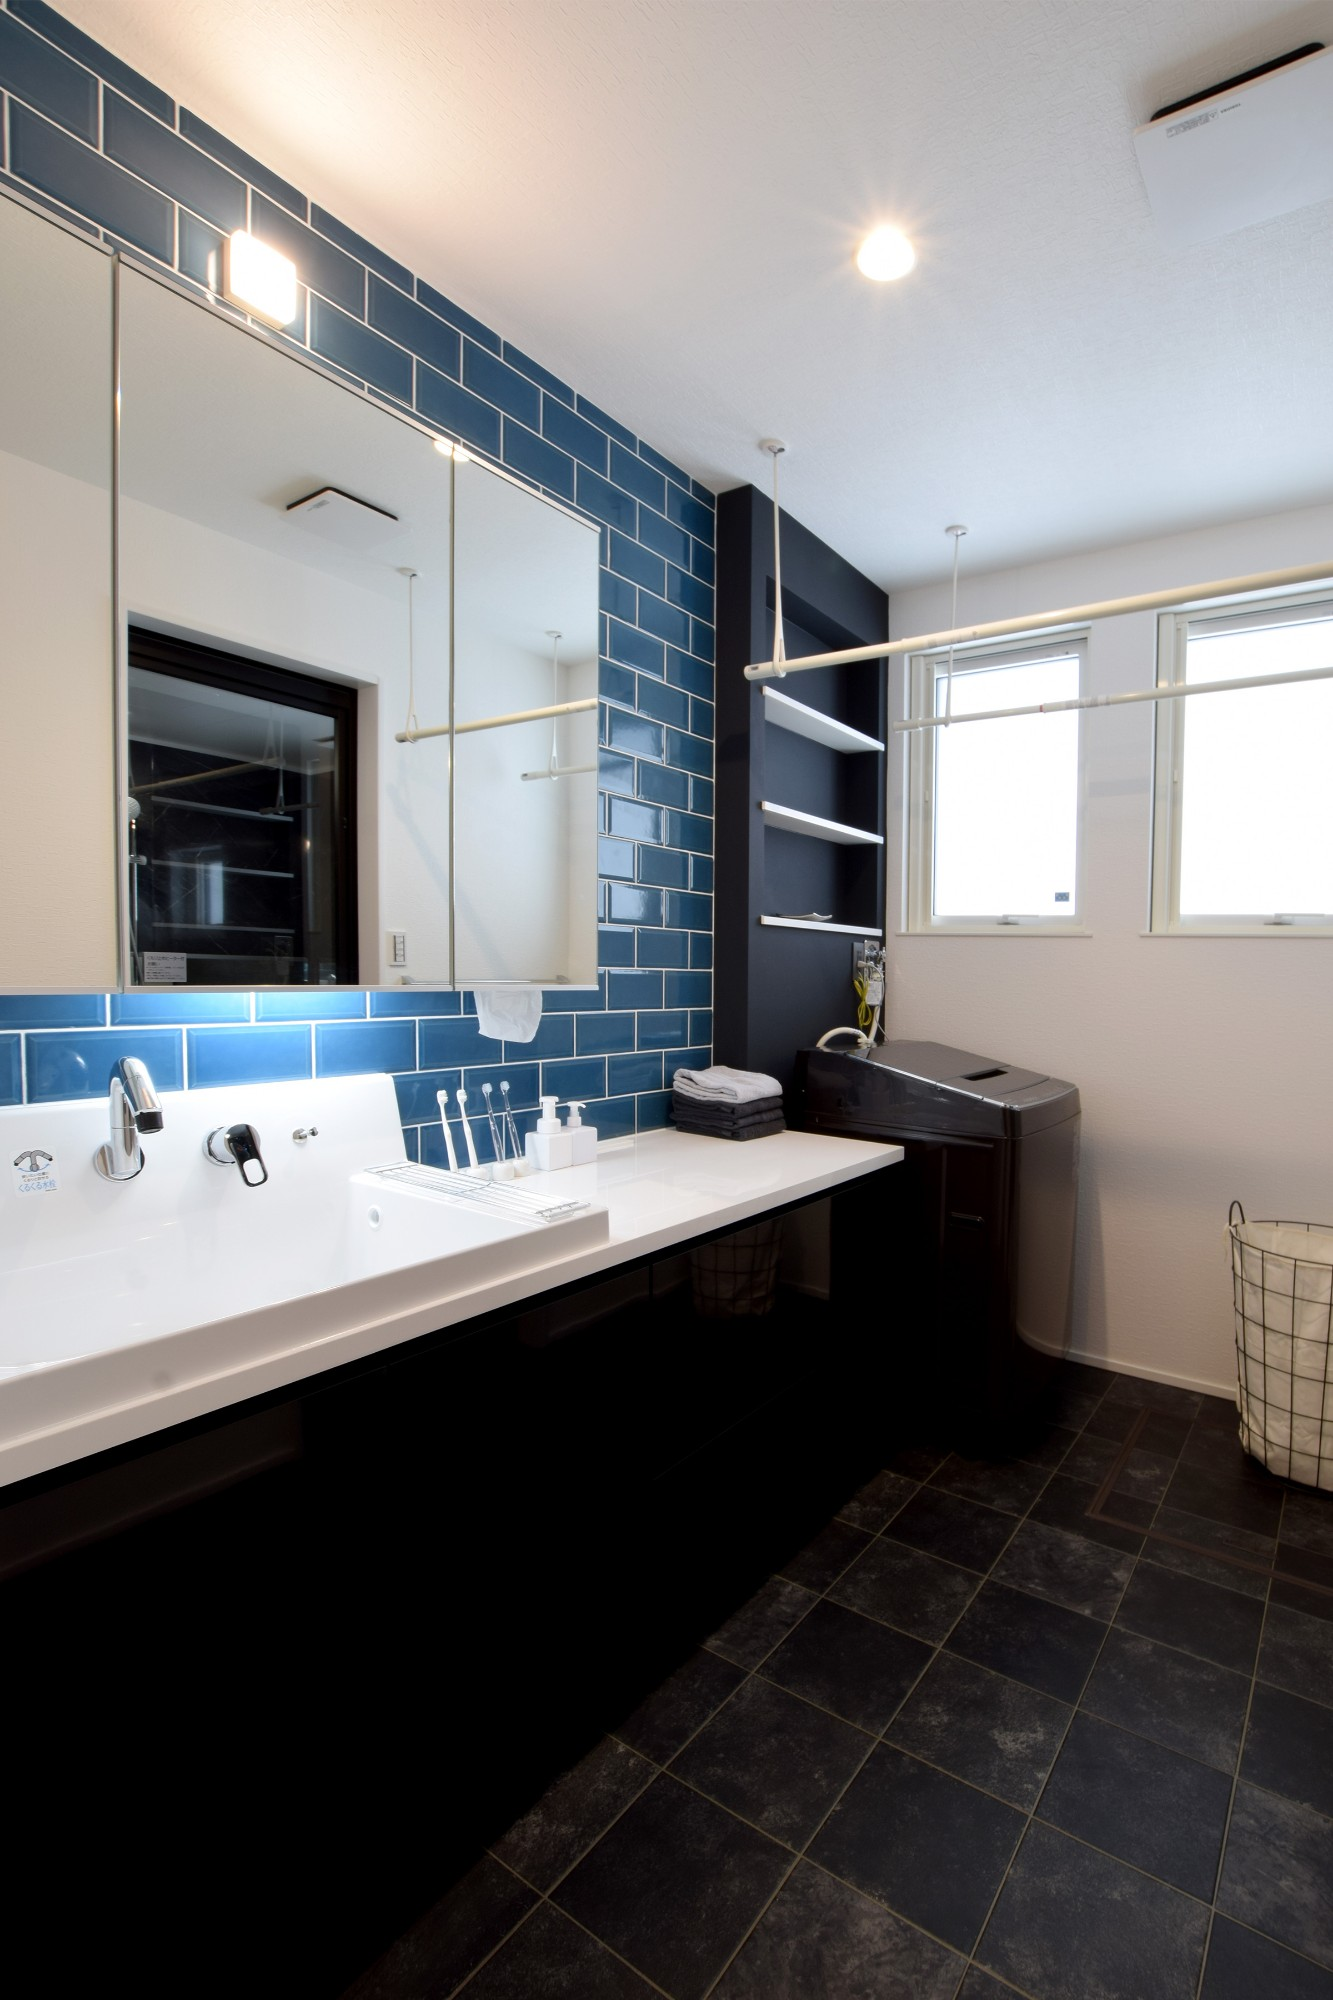 DETAIL HOME(ディテールホーム)「趣味と風景をたのしむ家」のヴィンテージな洗面所・脱衣所の実例写真